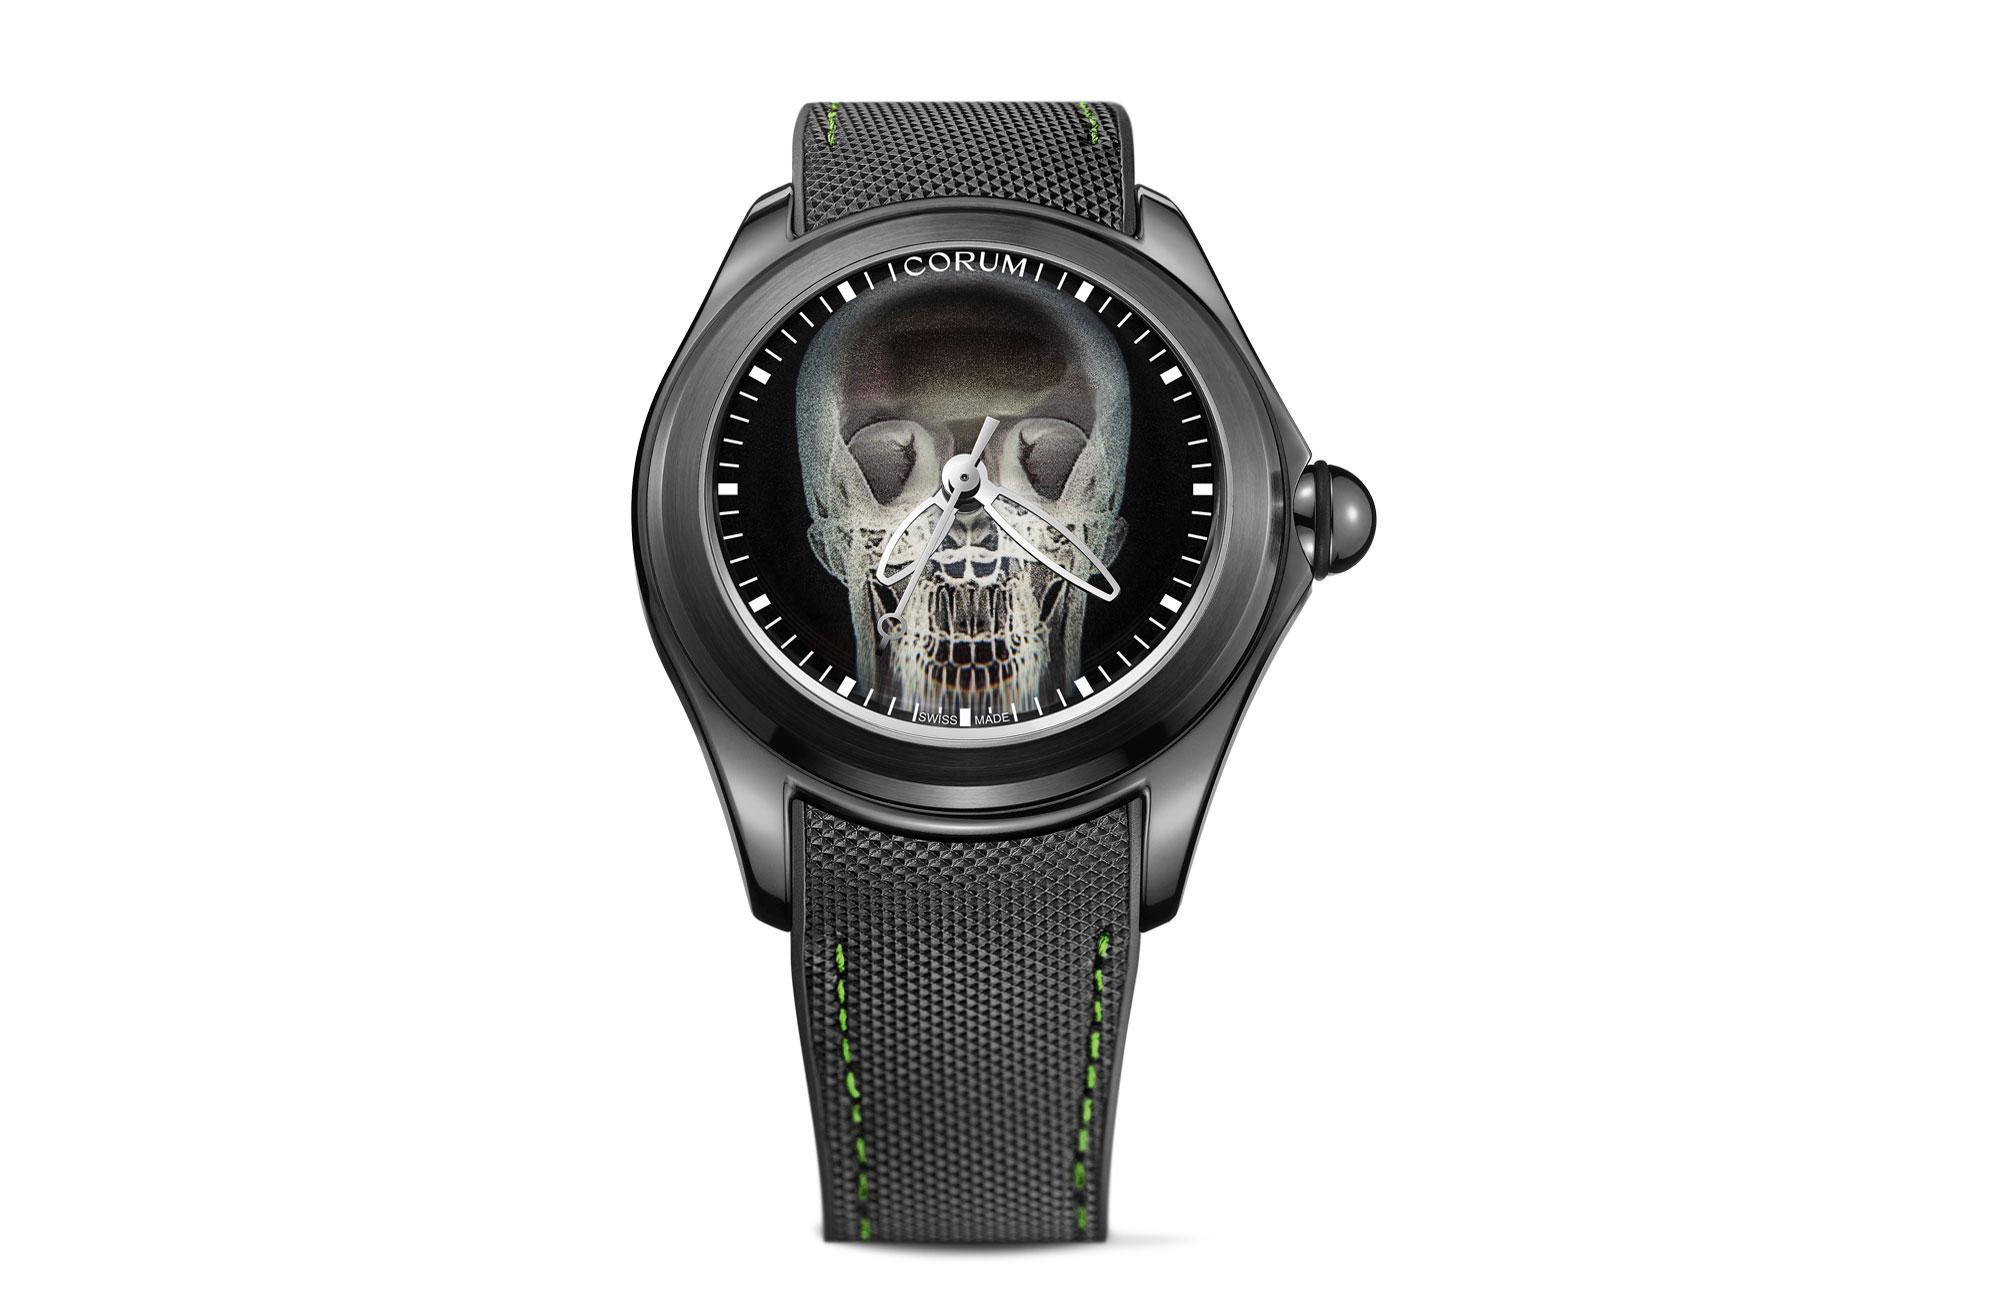 Severin Wunderman, Corum Bubble X Ray watch